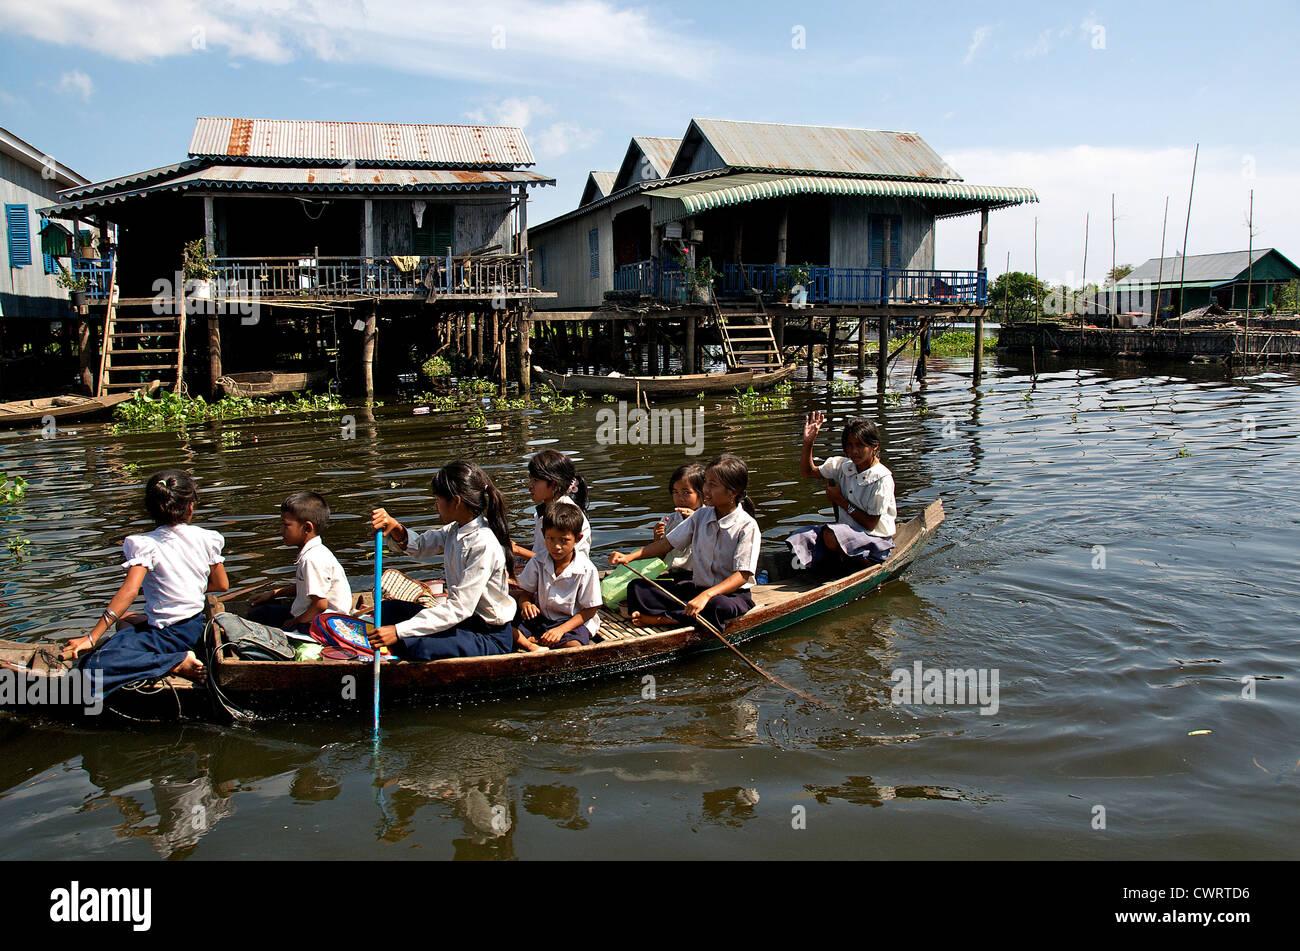 schoolchildren boat boating row rowing water Tonle Sap lake - Stock Image